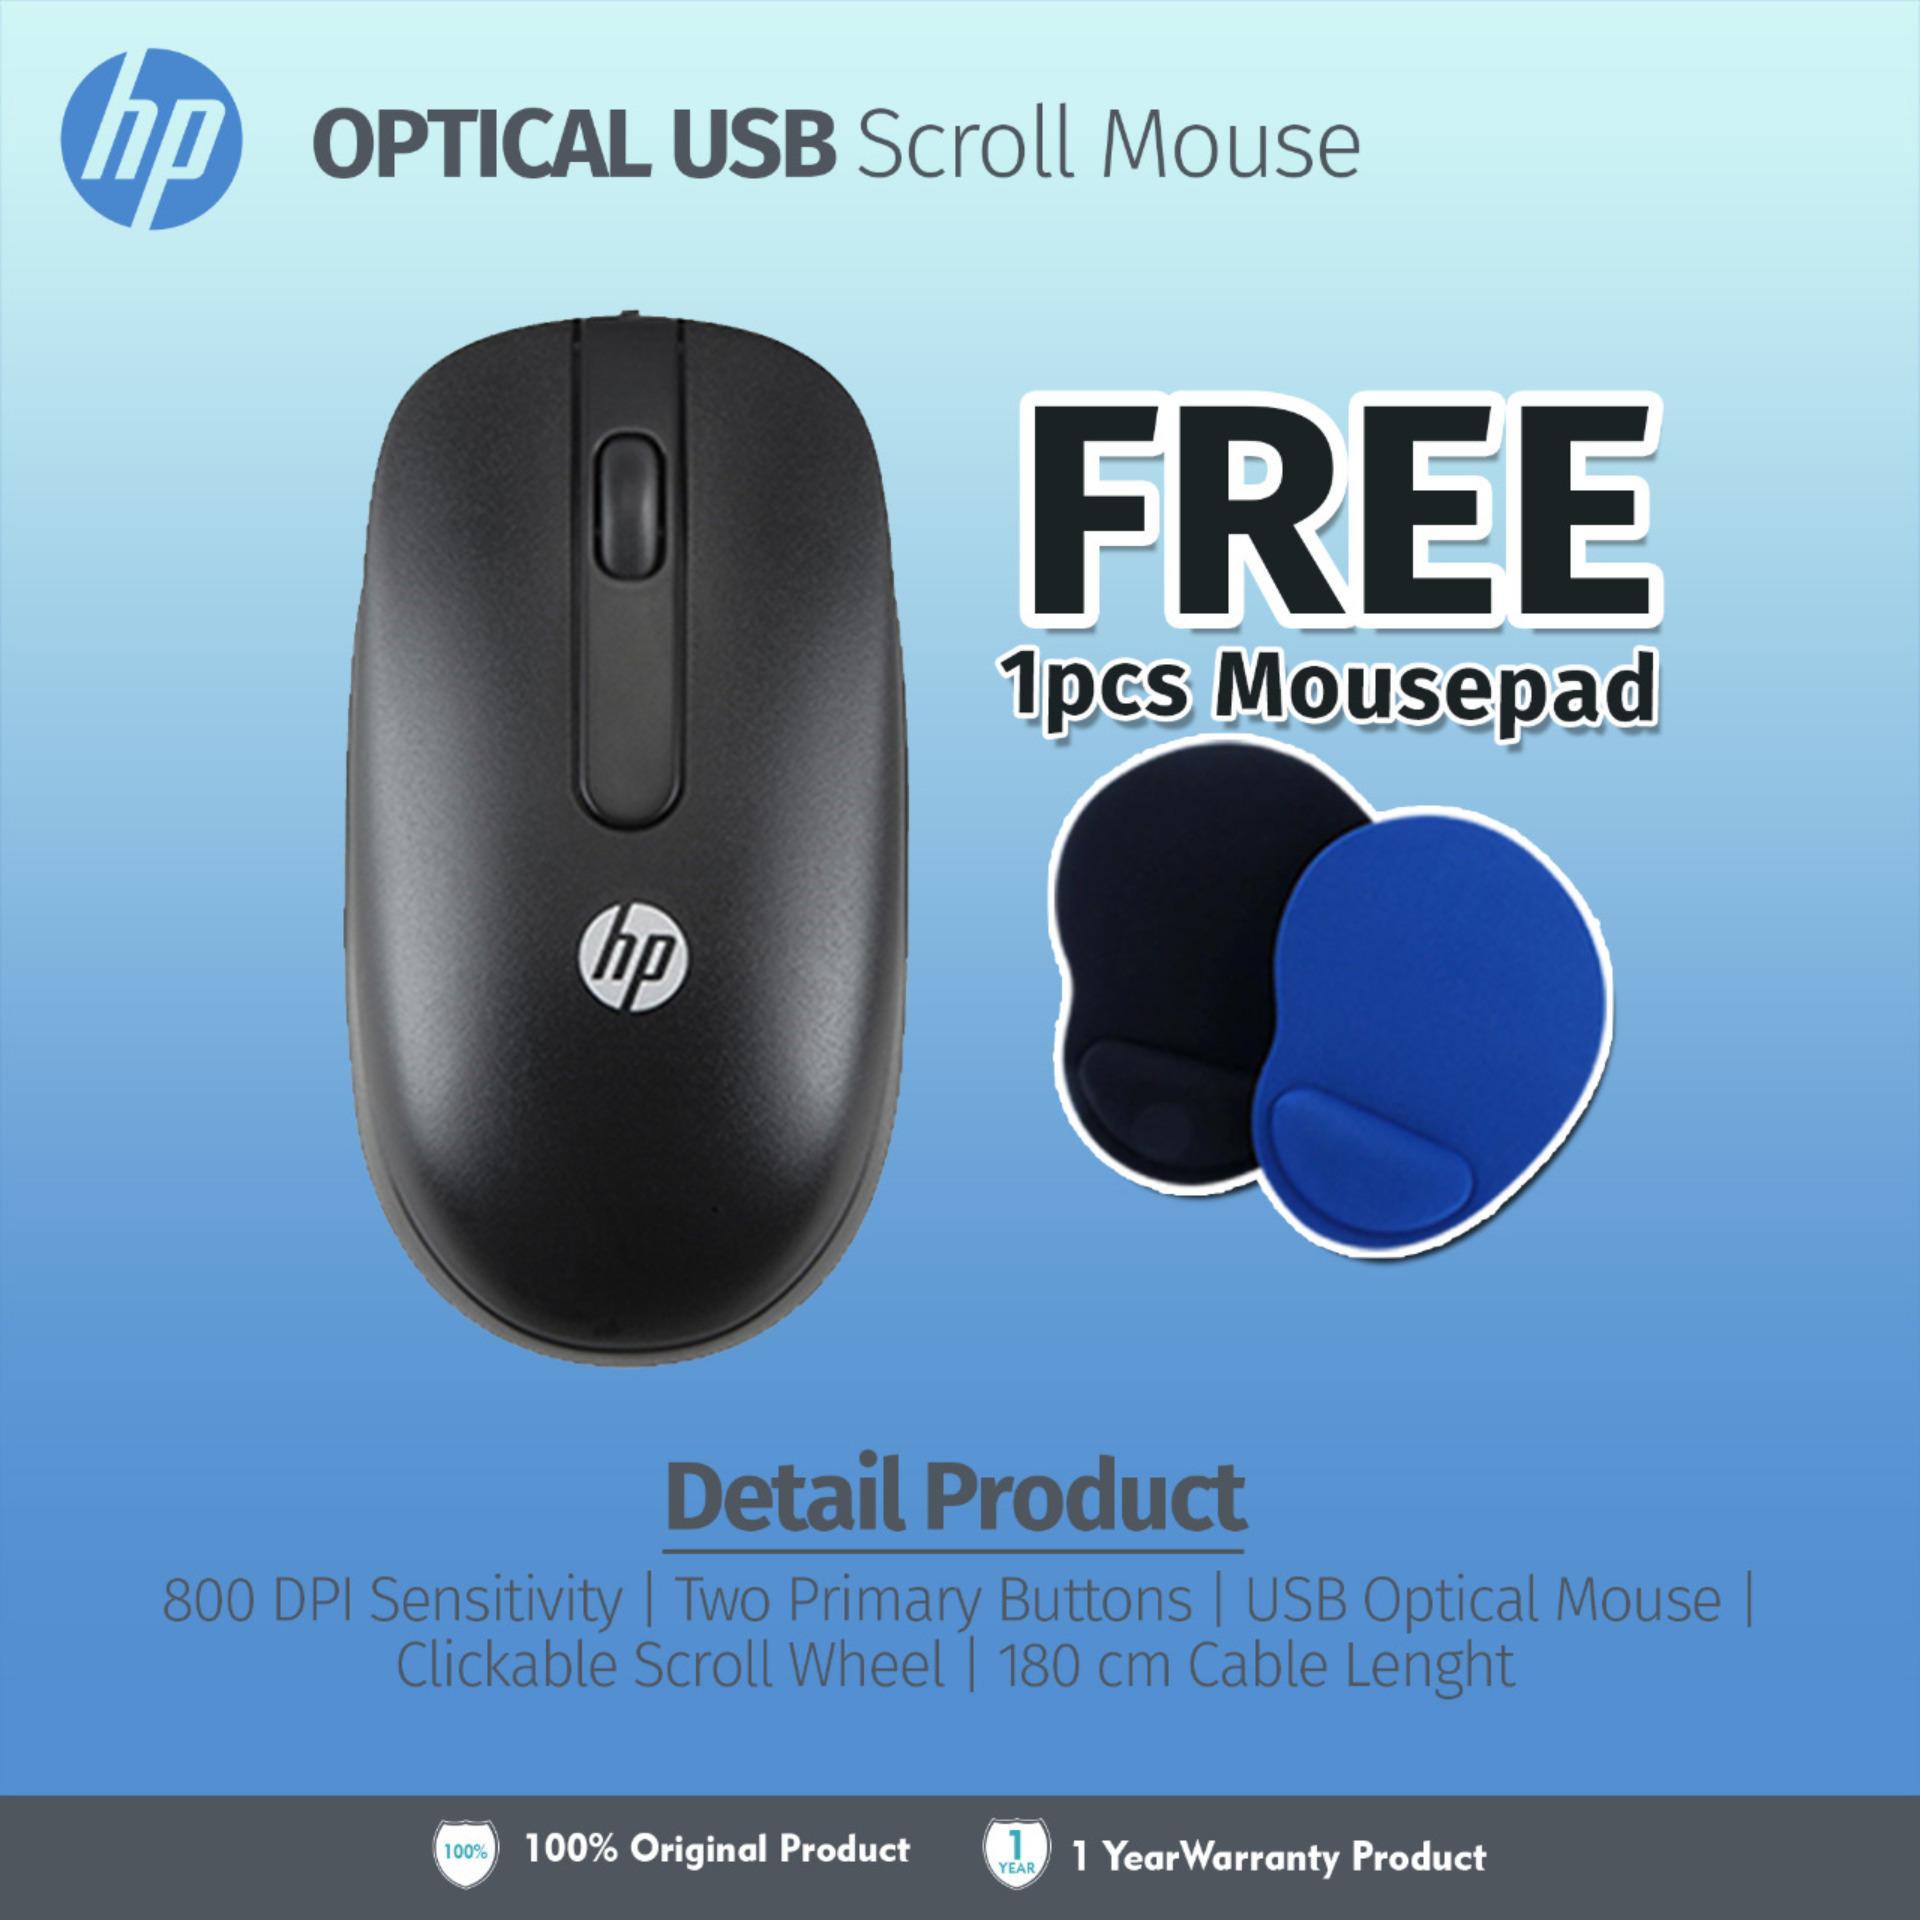 Kumpulan Harga Ram Ddr3 4gb Untuk Laptop Toshiba Oktober 2018 Votre Km 310 Wired Optical Mouse Hp Usb Scroll Mousepad